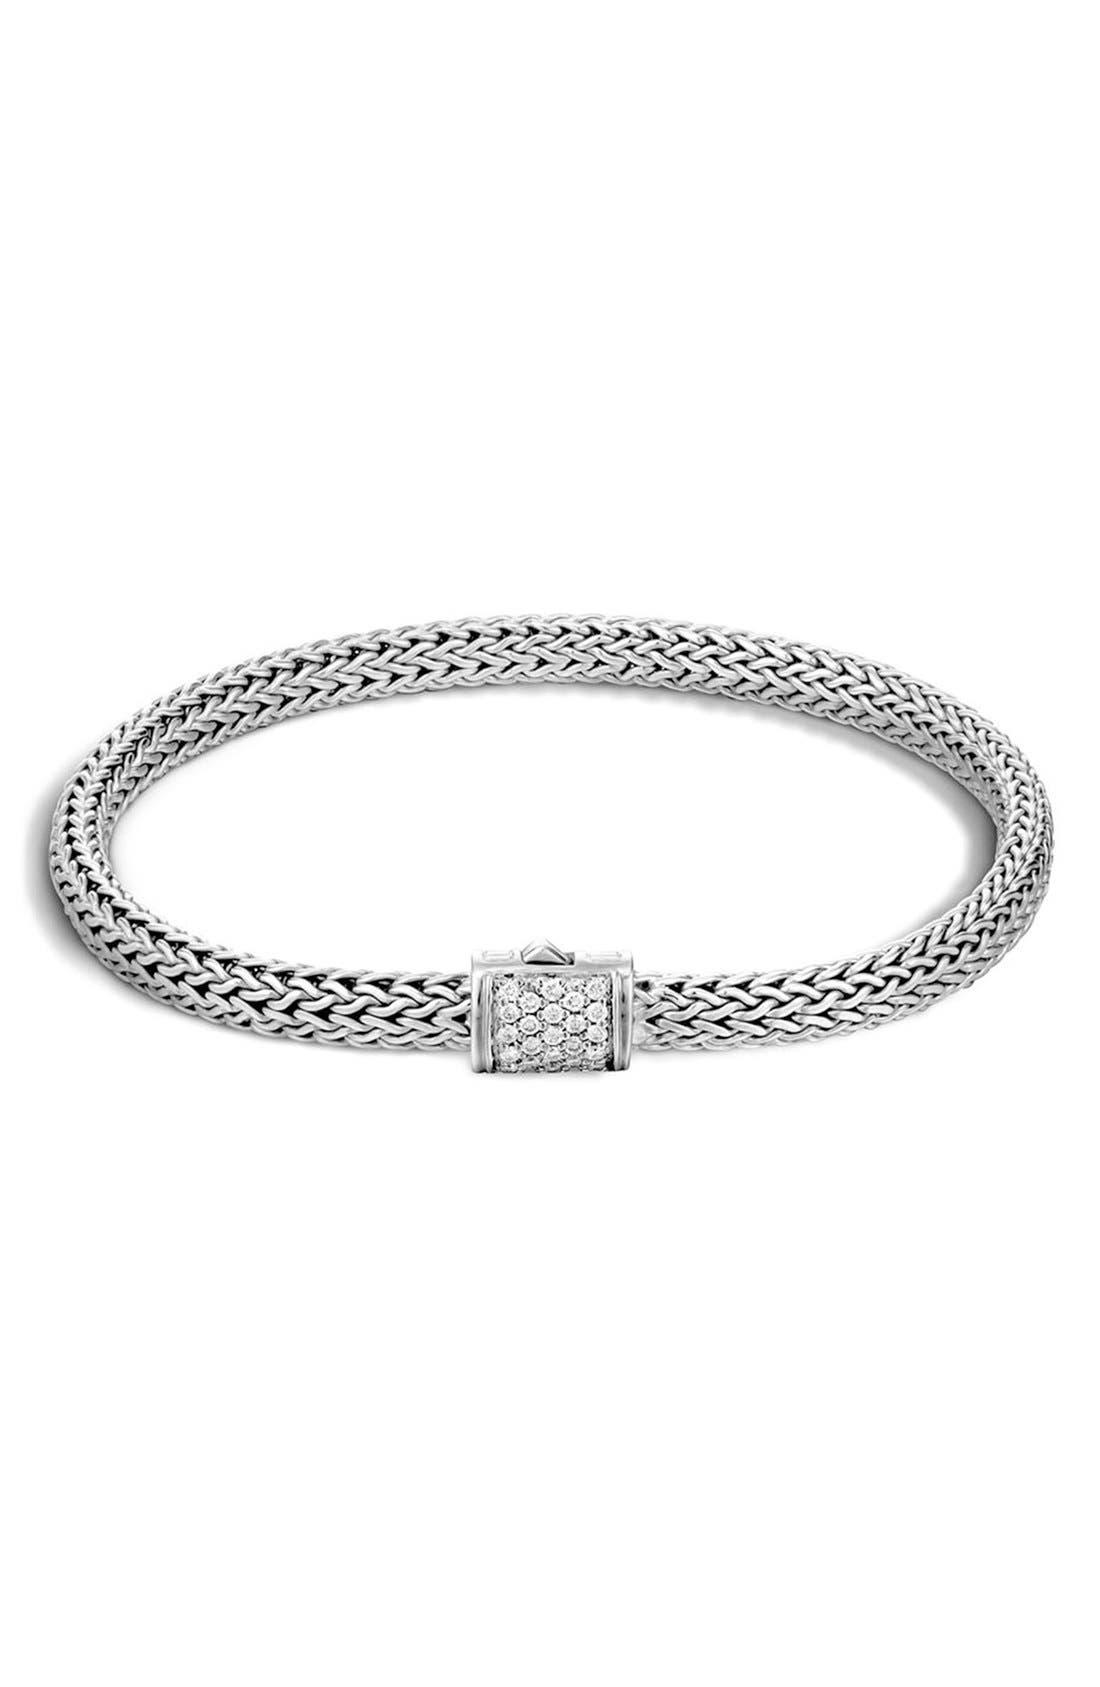 Main Image - John Hardy Classic Chain 5mm Diamond Bracelet